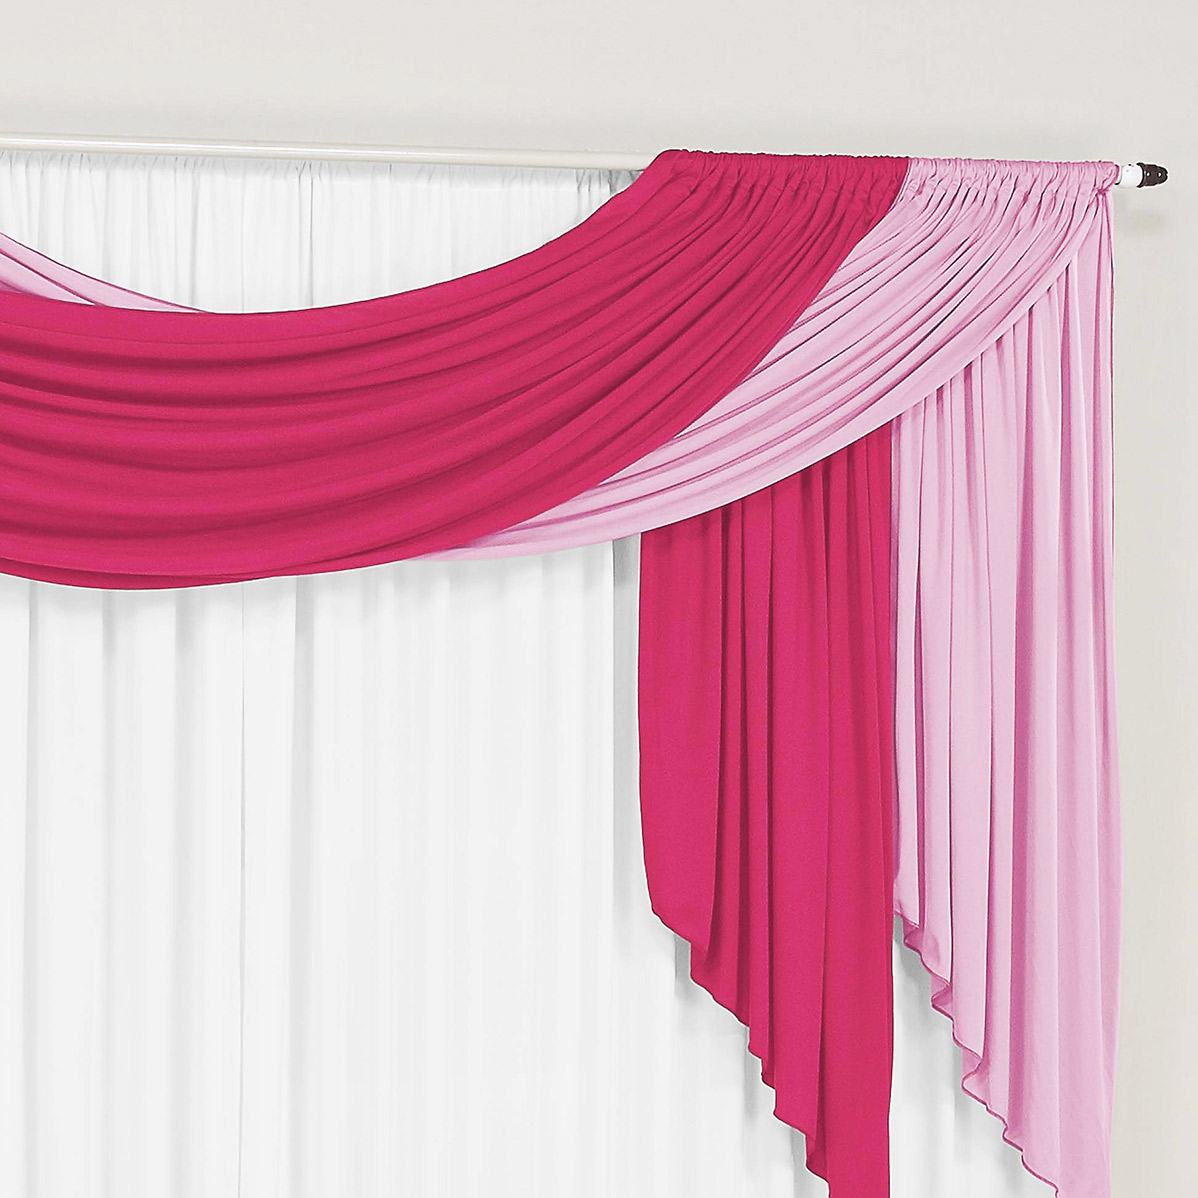 Cortina 3 metros Isabela Pink Rosa  com 1 peças